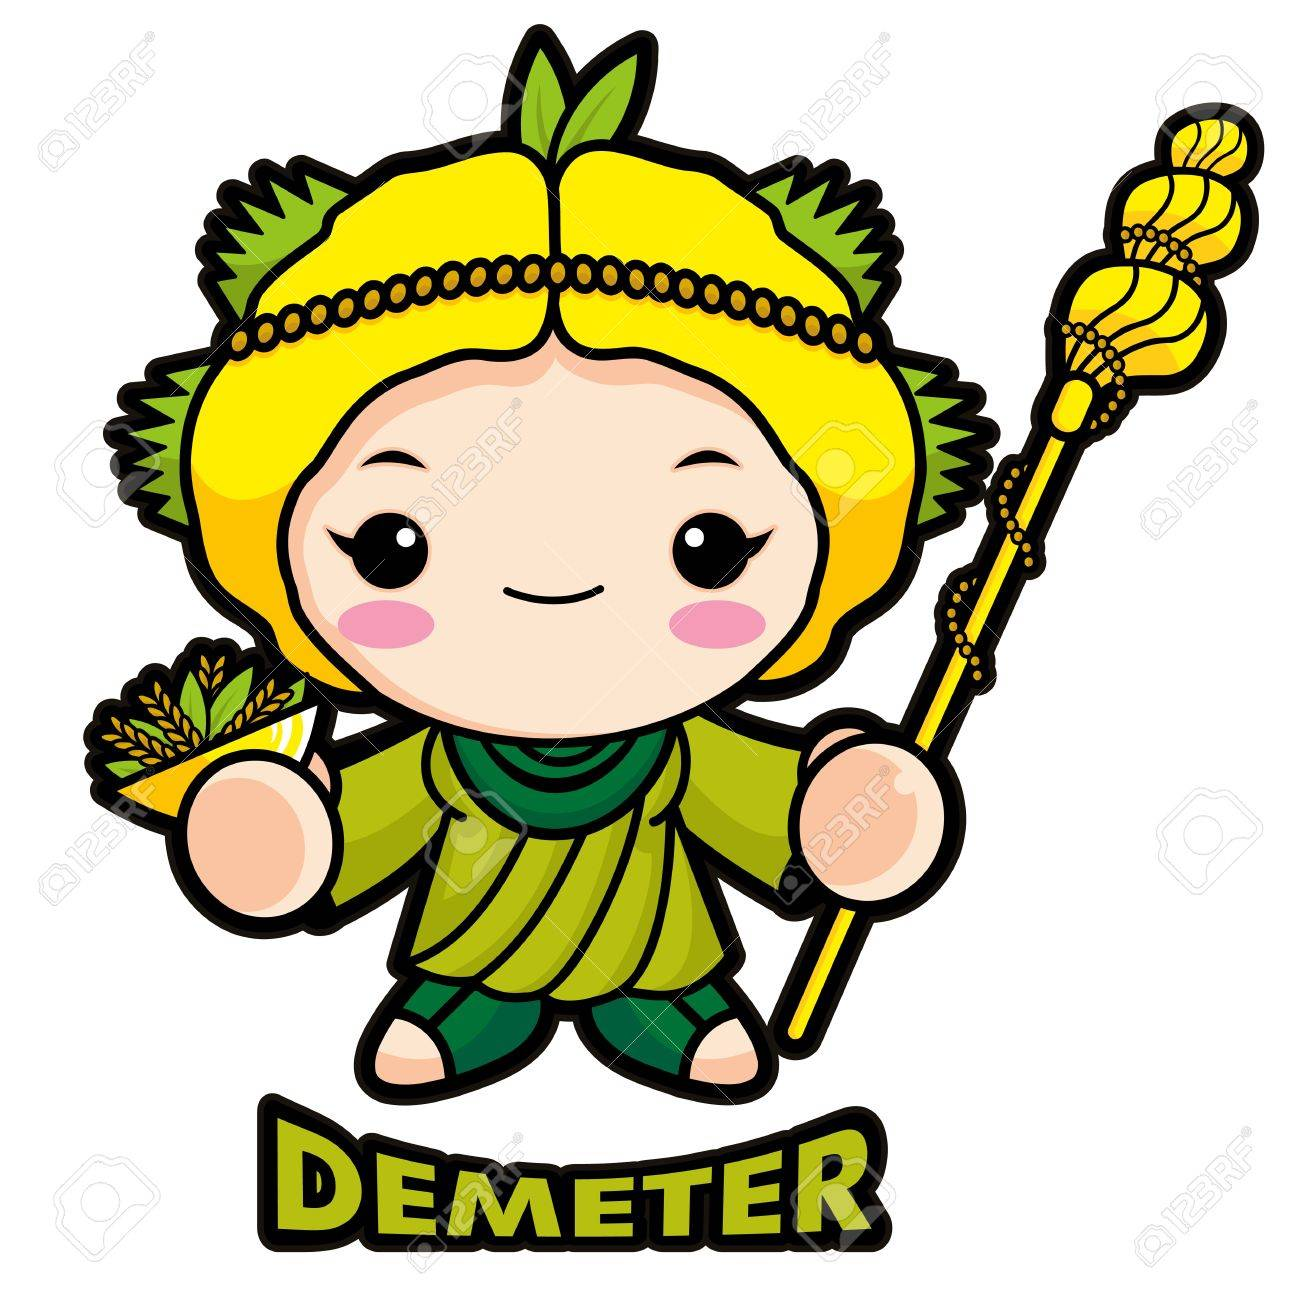 Demeter Symbols